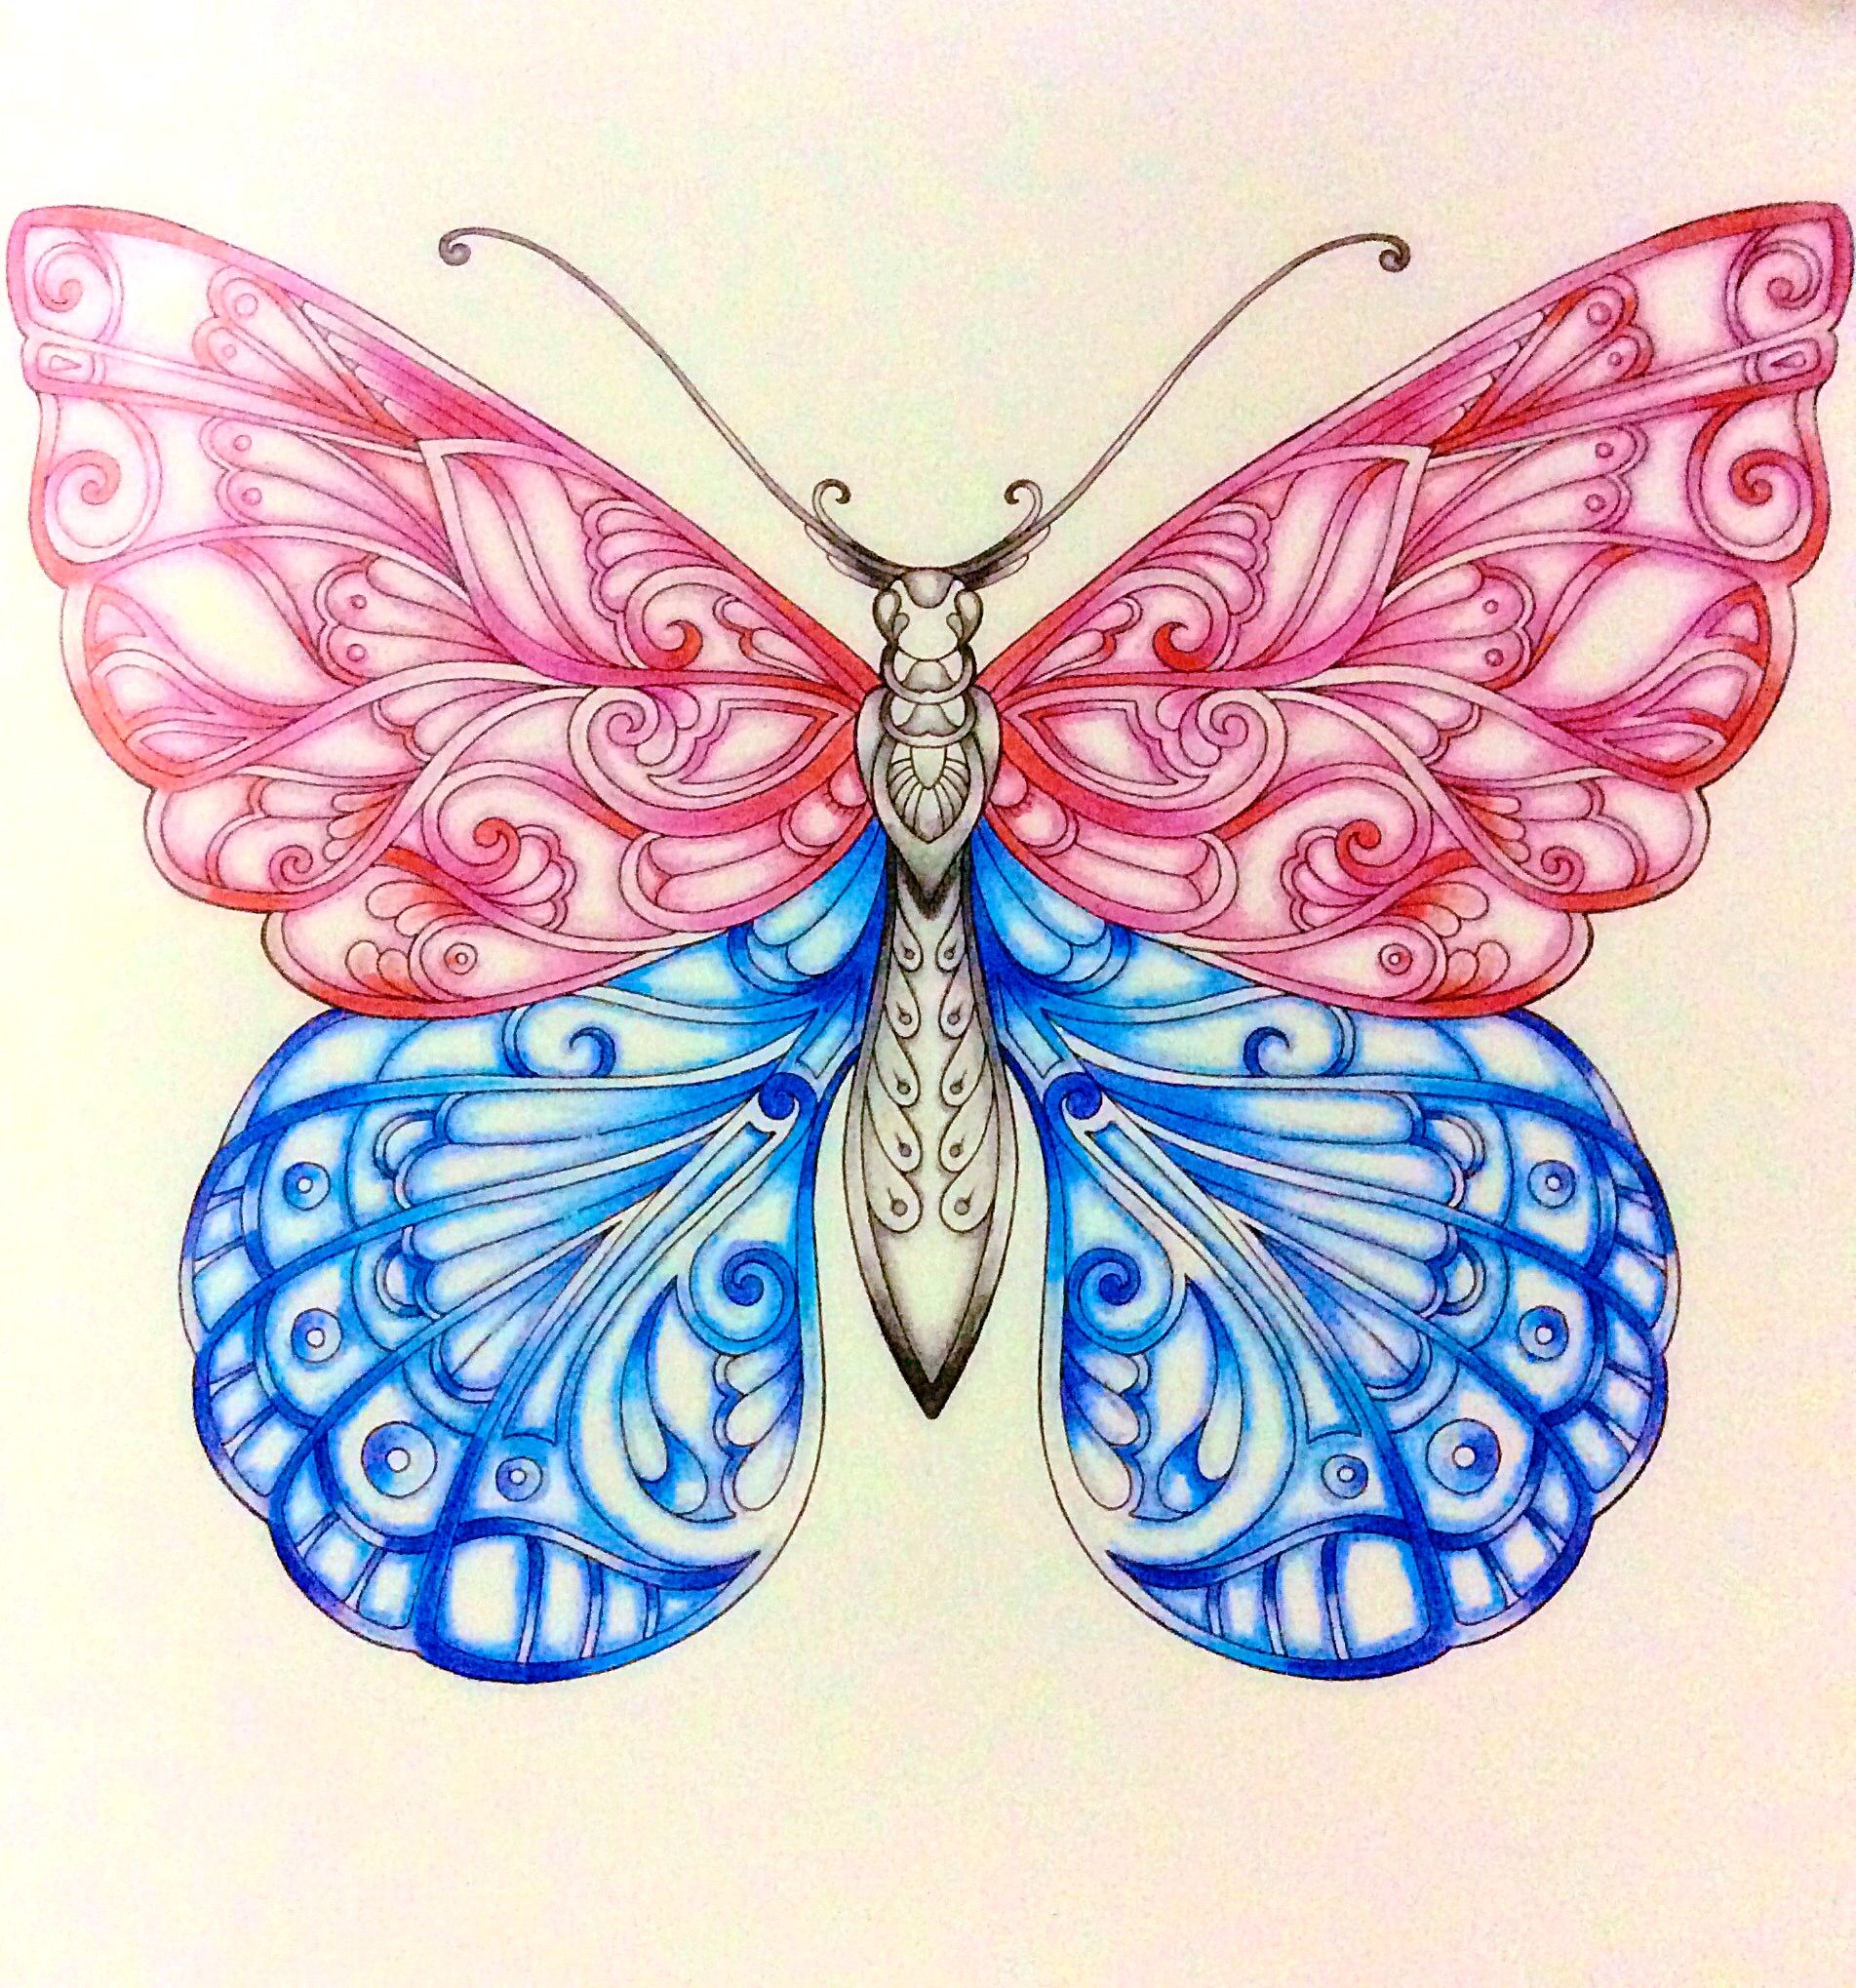 Magical Jungle Butterfly Johanna Basford Johanna Basford Coloring Book Johanna Basford Coloring Basford Coloring